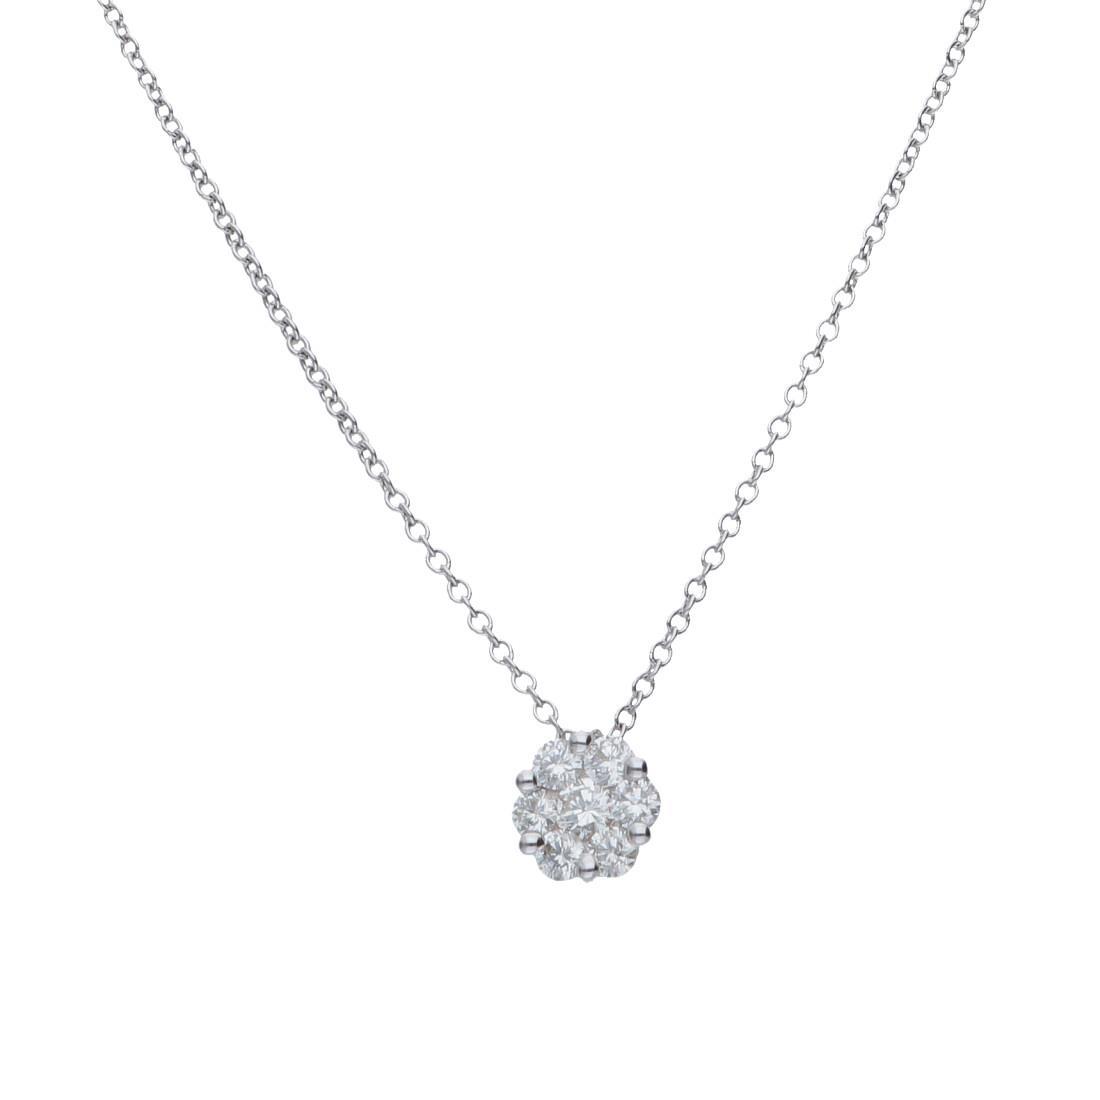 Collana punto luce con diamanti ct. 0,33 - ALFIERI & ST. JOHN